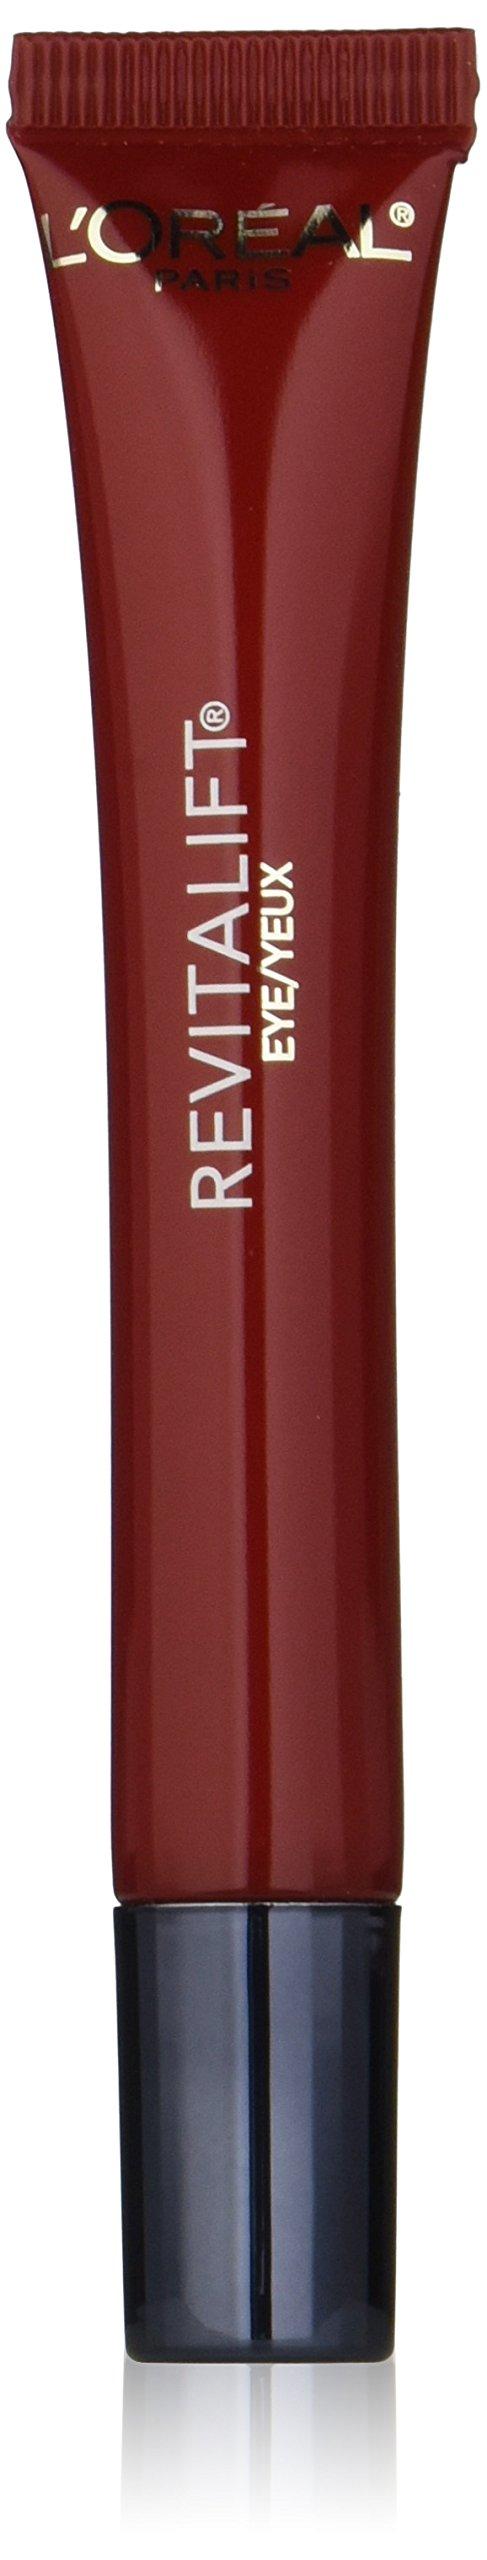 L'Oreal Paris RevitaLift Triple Power Eye Treatment, 0.5 Fluid Ounce